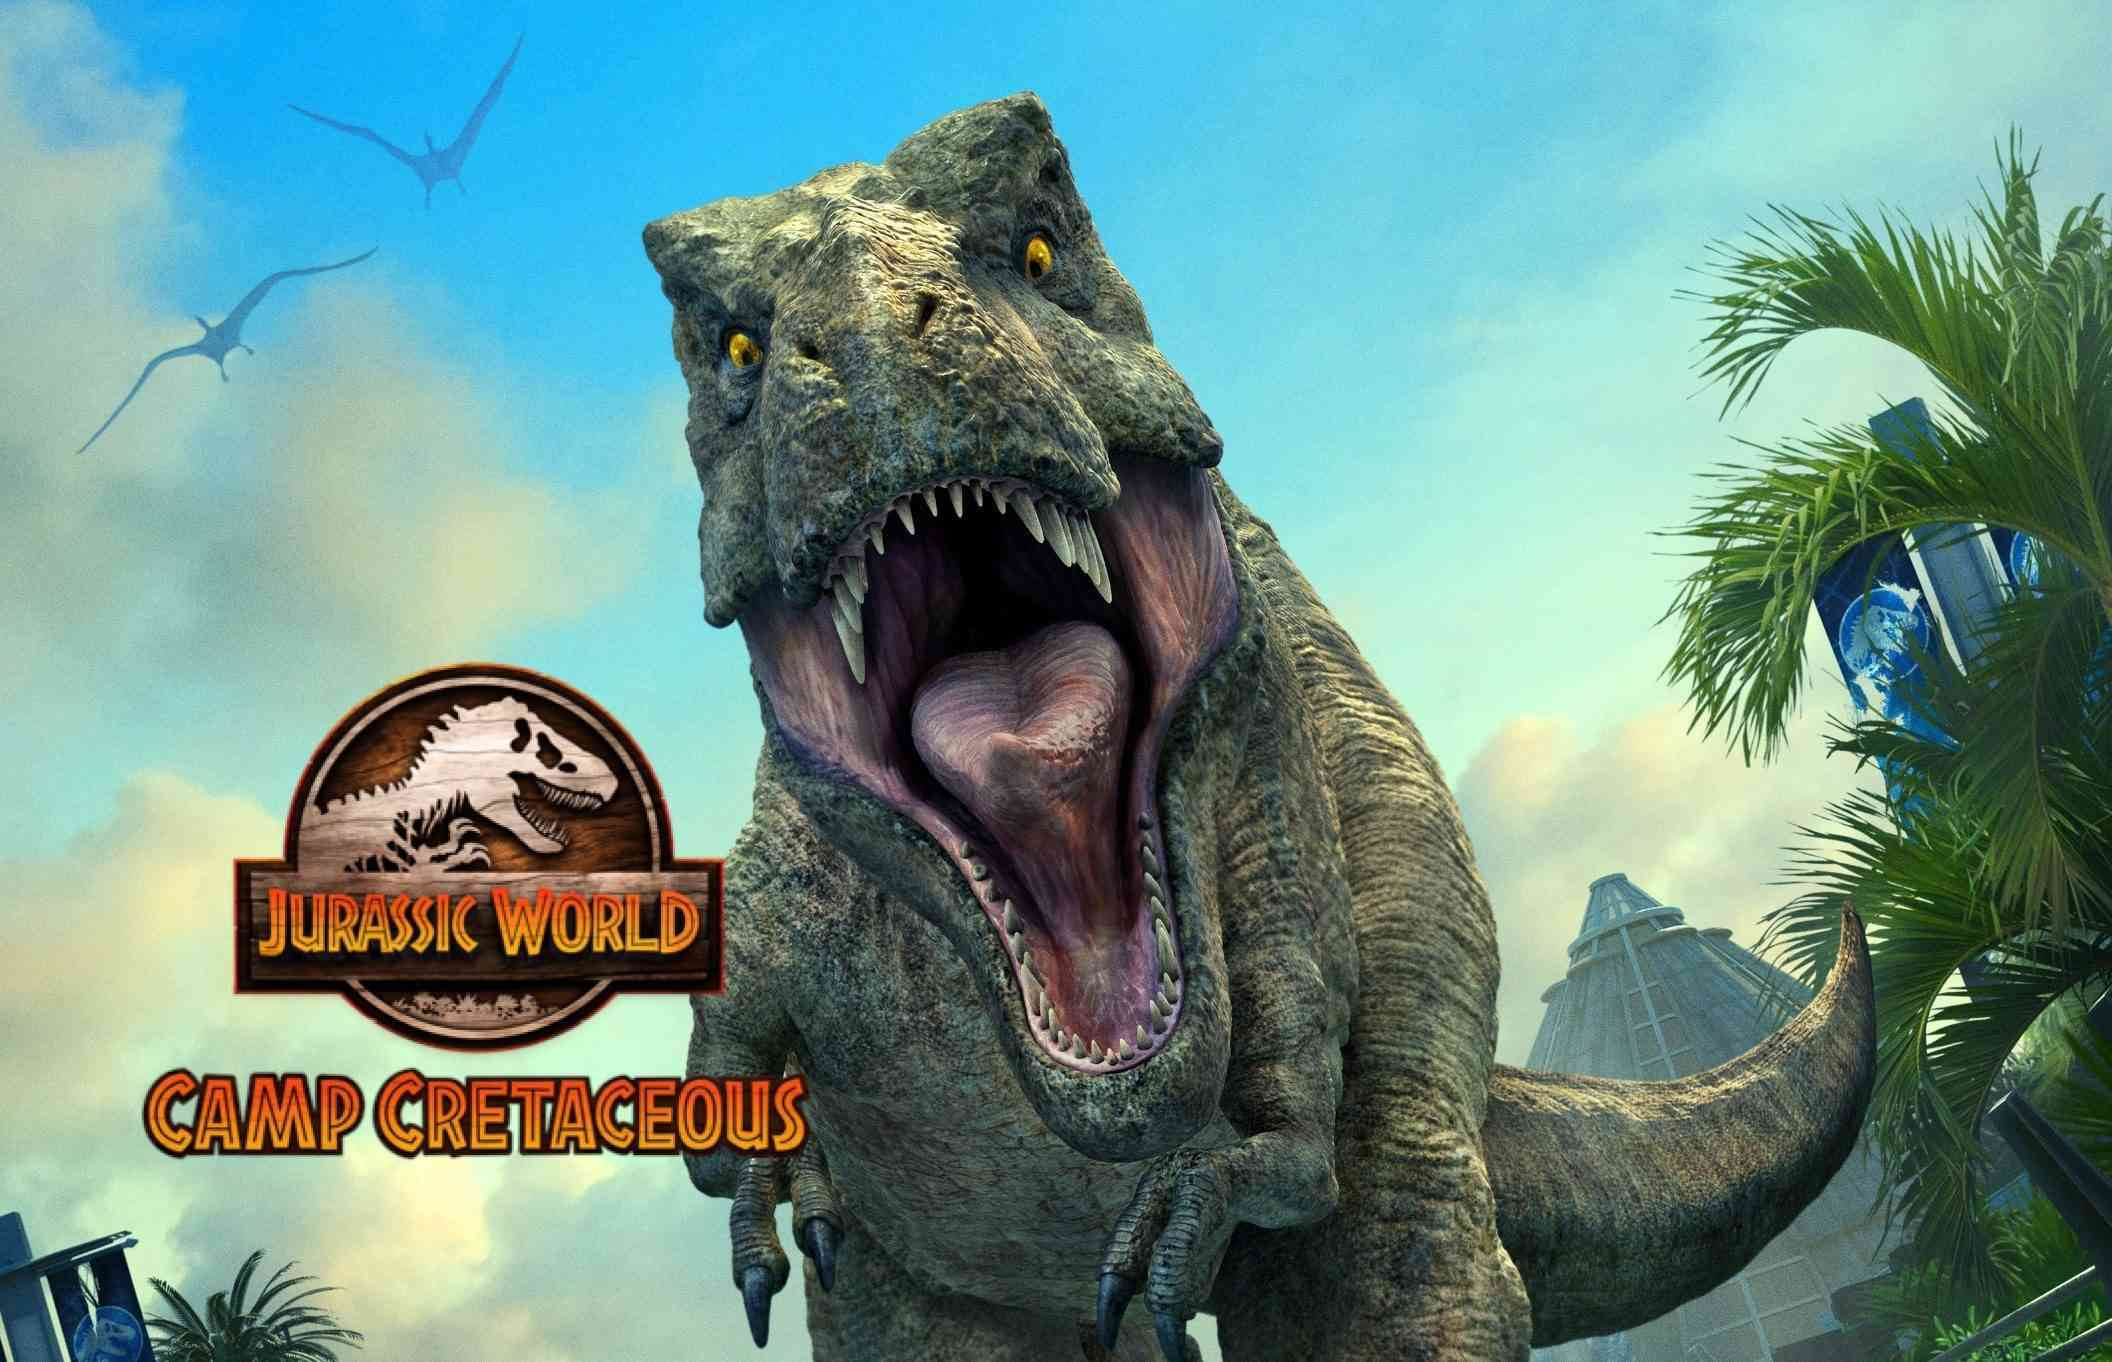 T-Rex in Jurassic World Camp Cretaceous